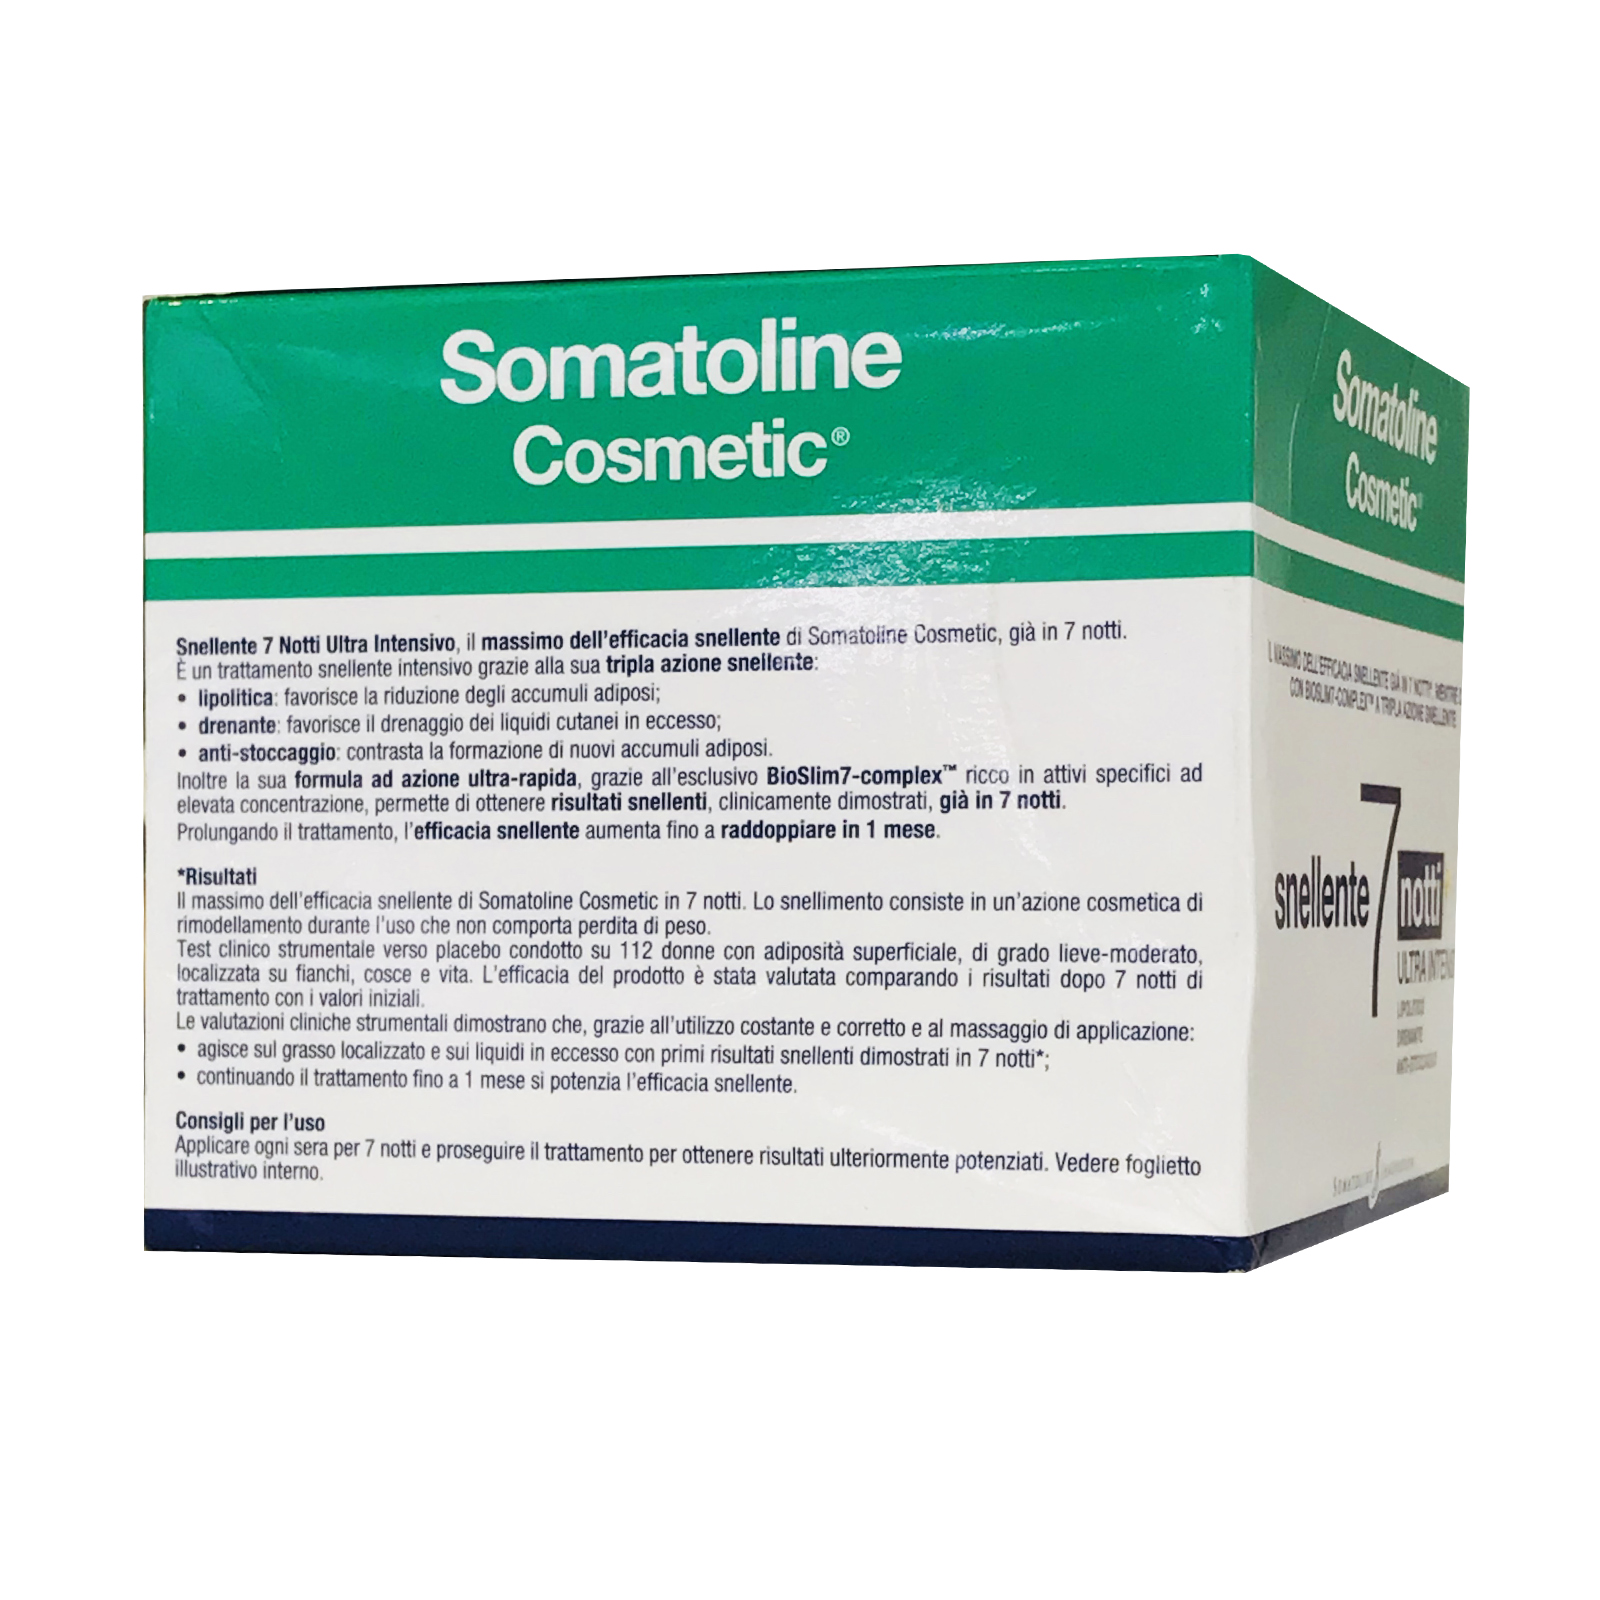 Somatoline Cosmetic Snellente Intensivo 7 Notti 400ml (七日瘦)